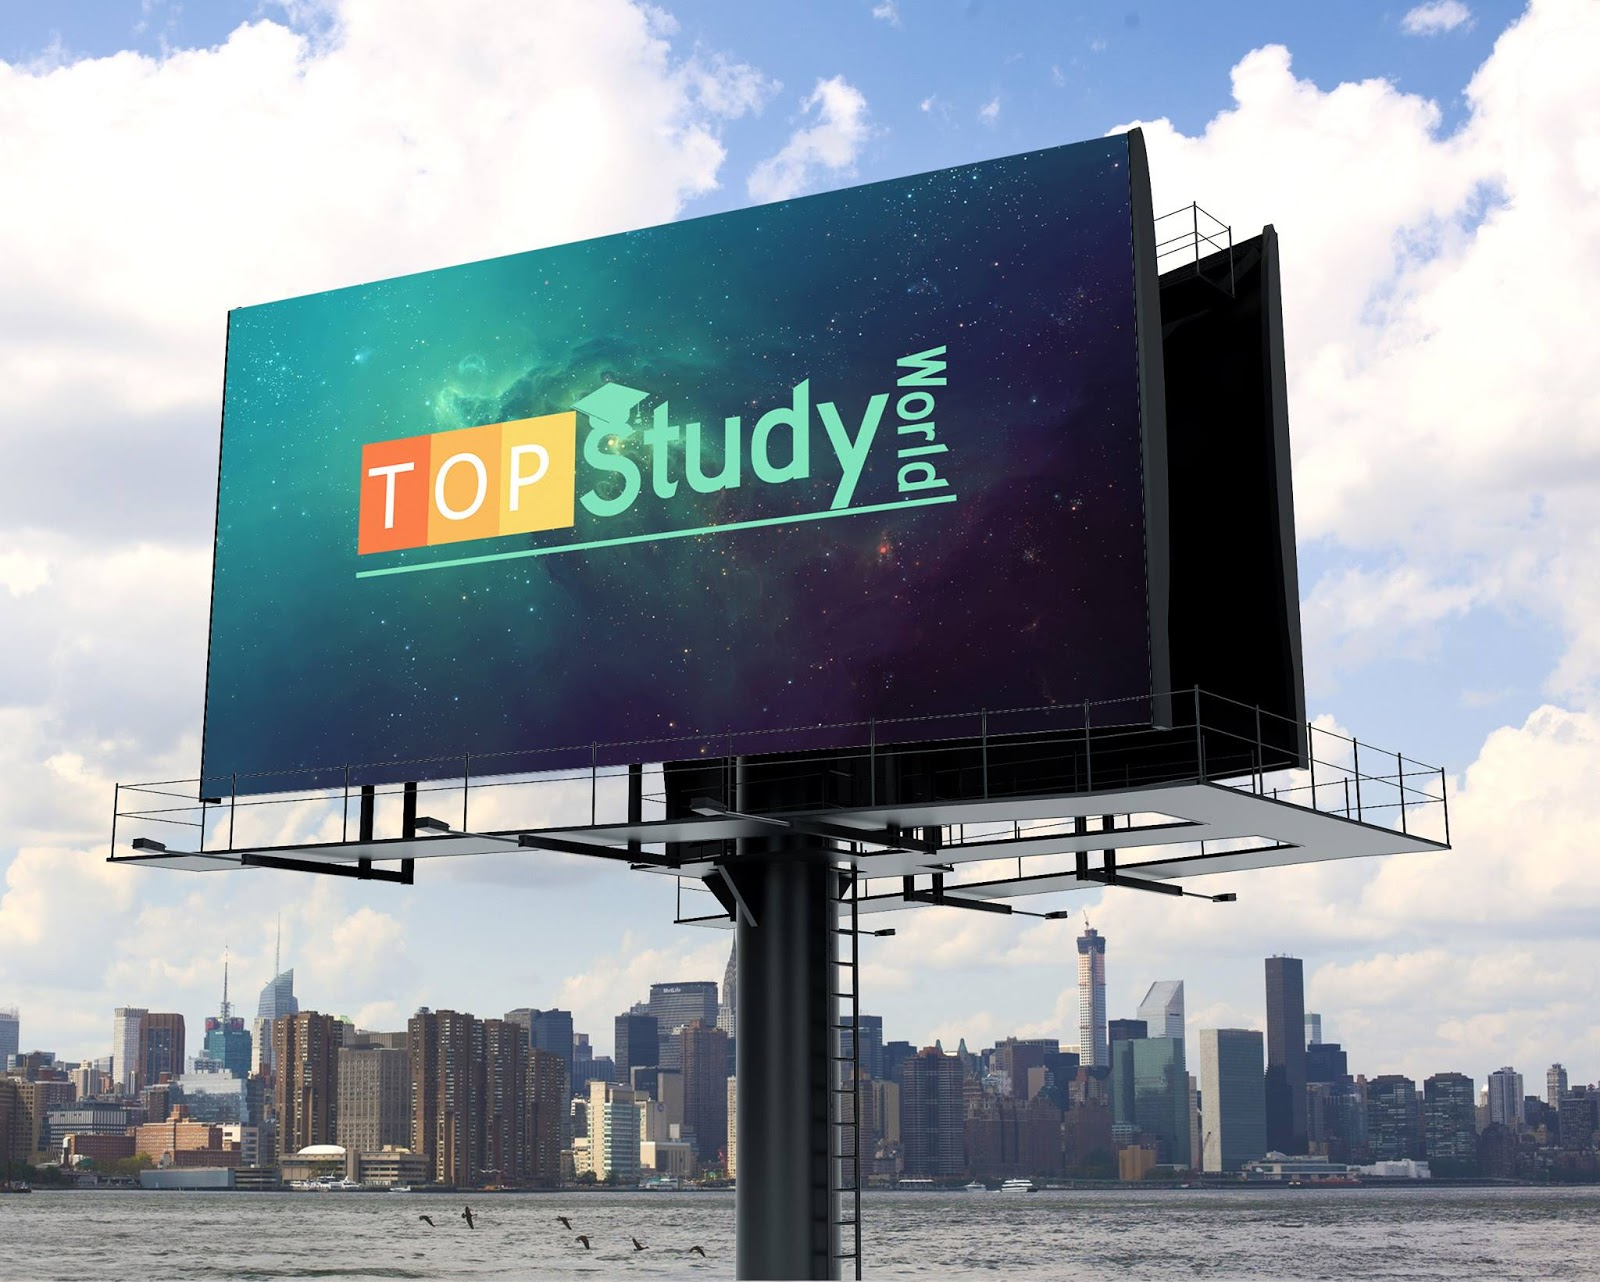 Top Study World HD Wallpaper